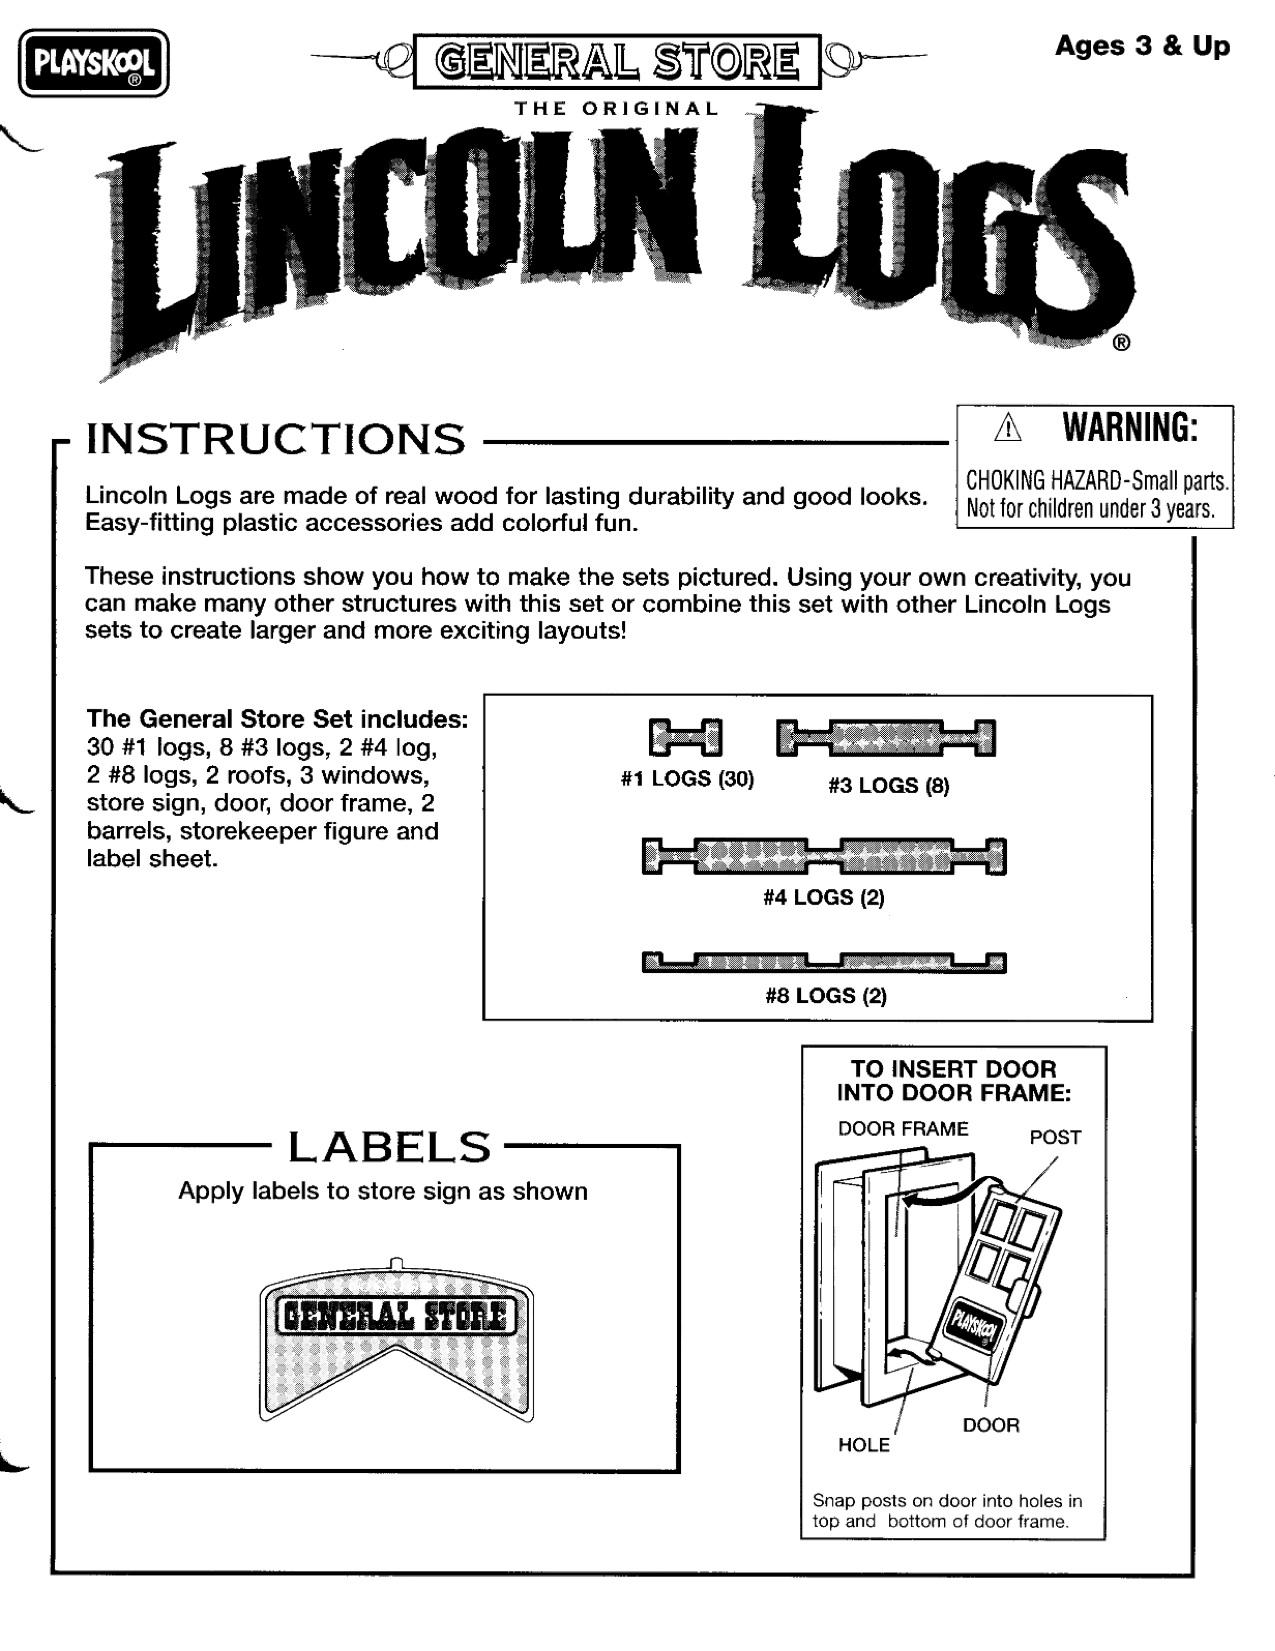 LincolnLogsGeneralStore.jpg